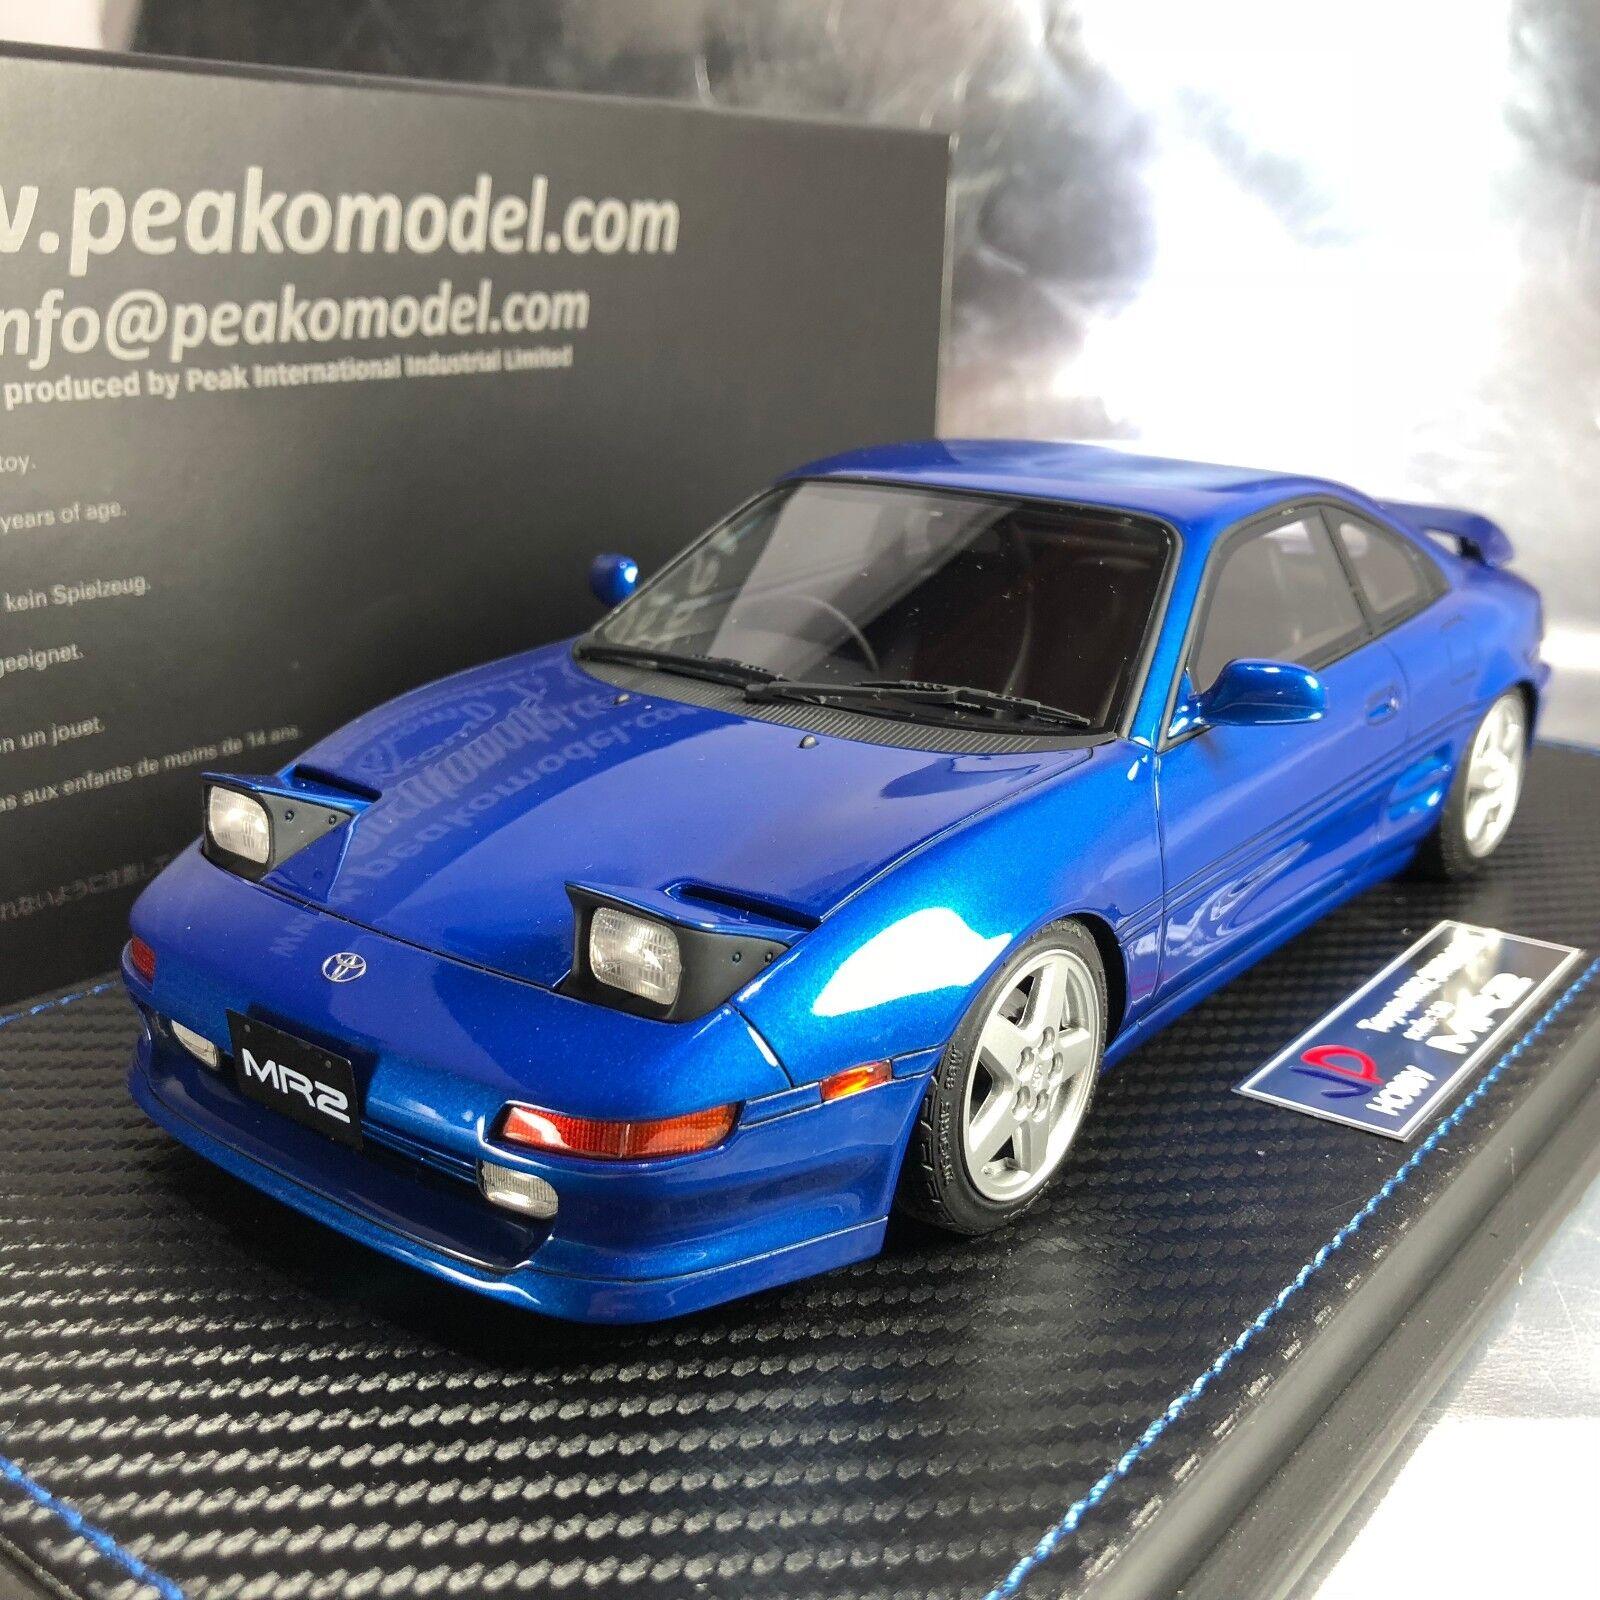 1/18 Peako JP Hobby #82405 Toyota MR2 SW20 1995 revision 3 Azure Blue